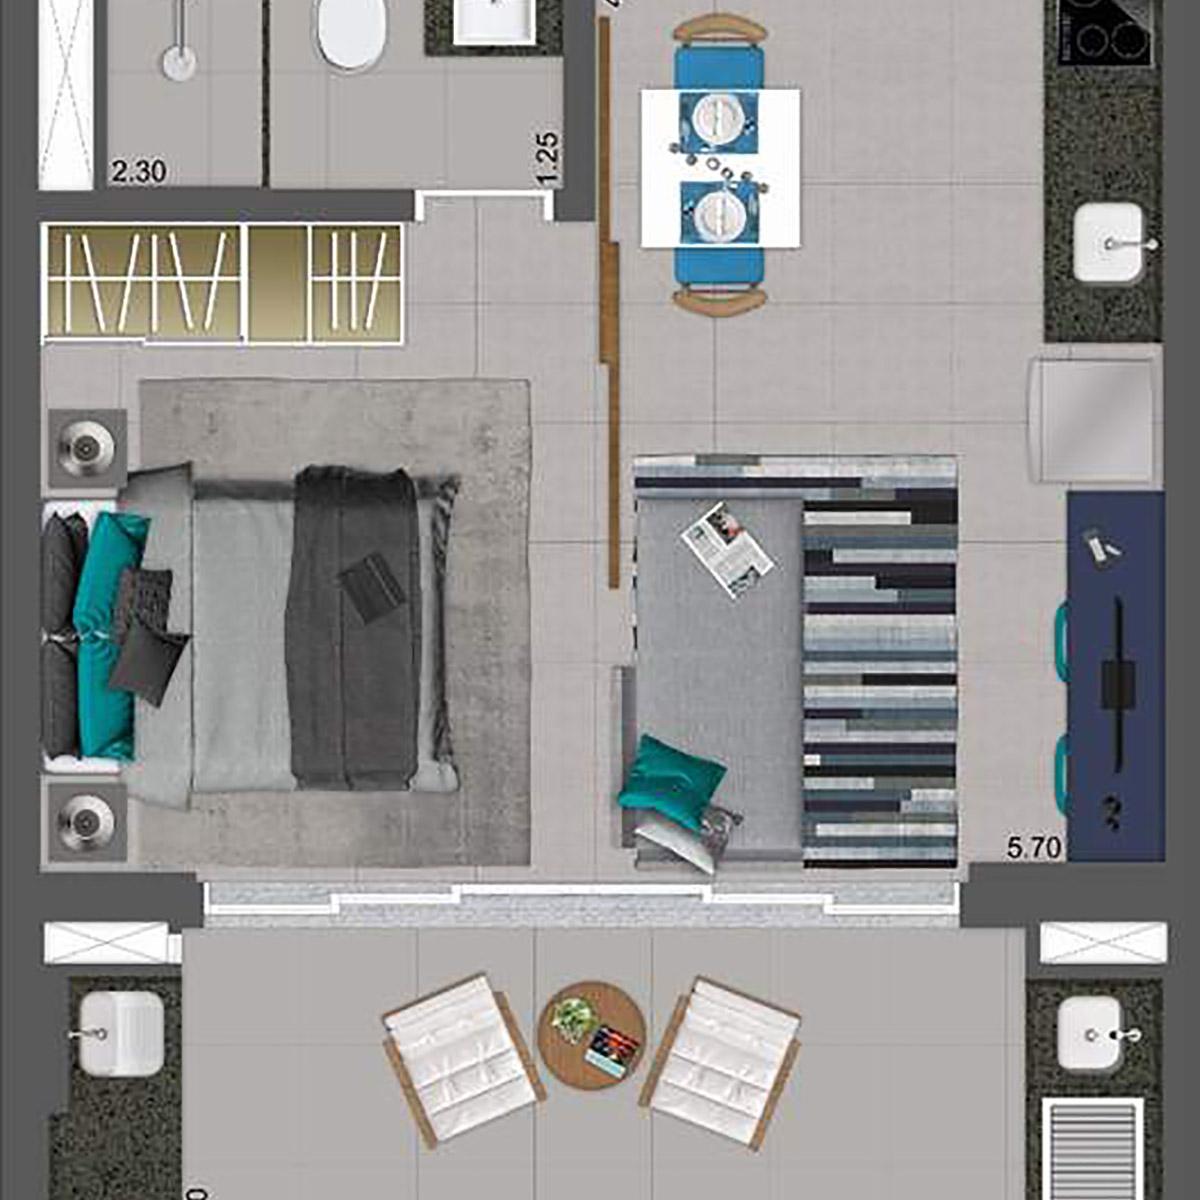 39 m² - Living Integrado Parkway Panamby